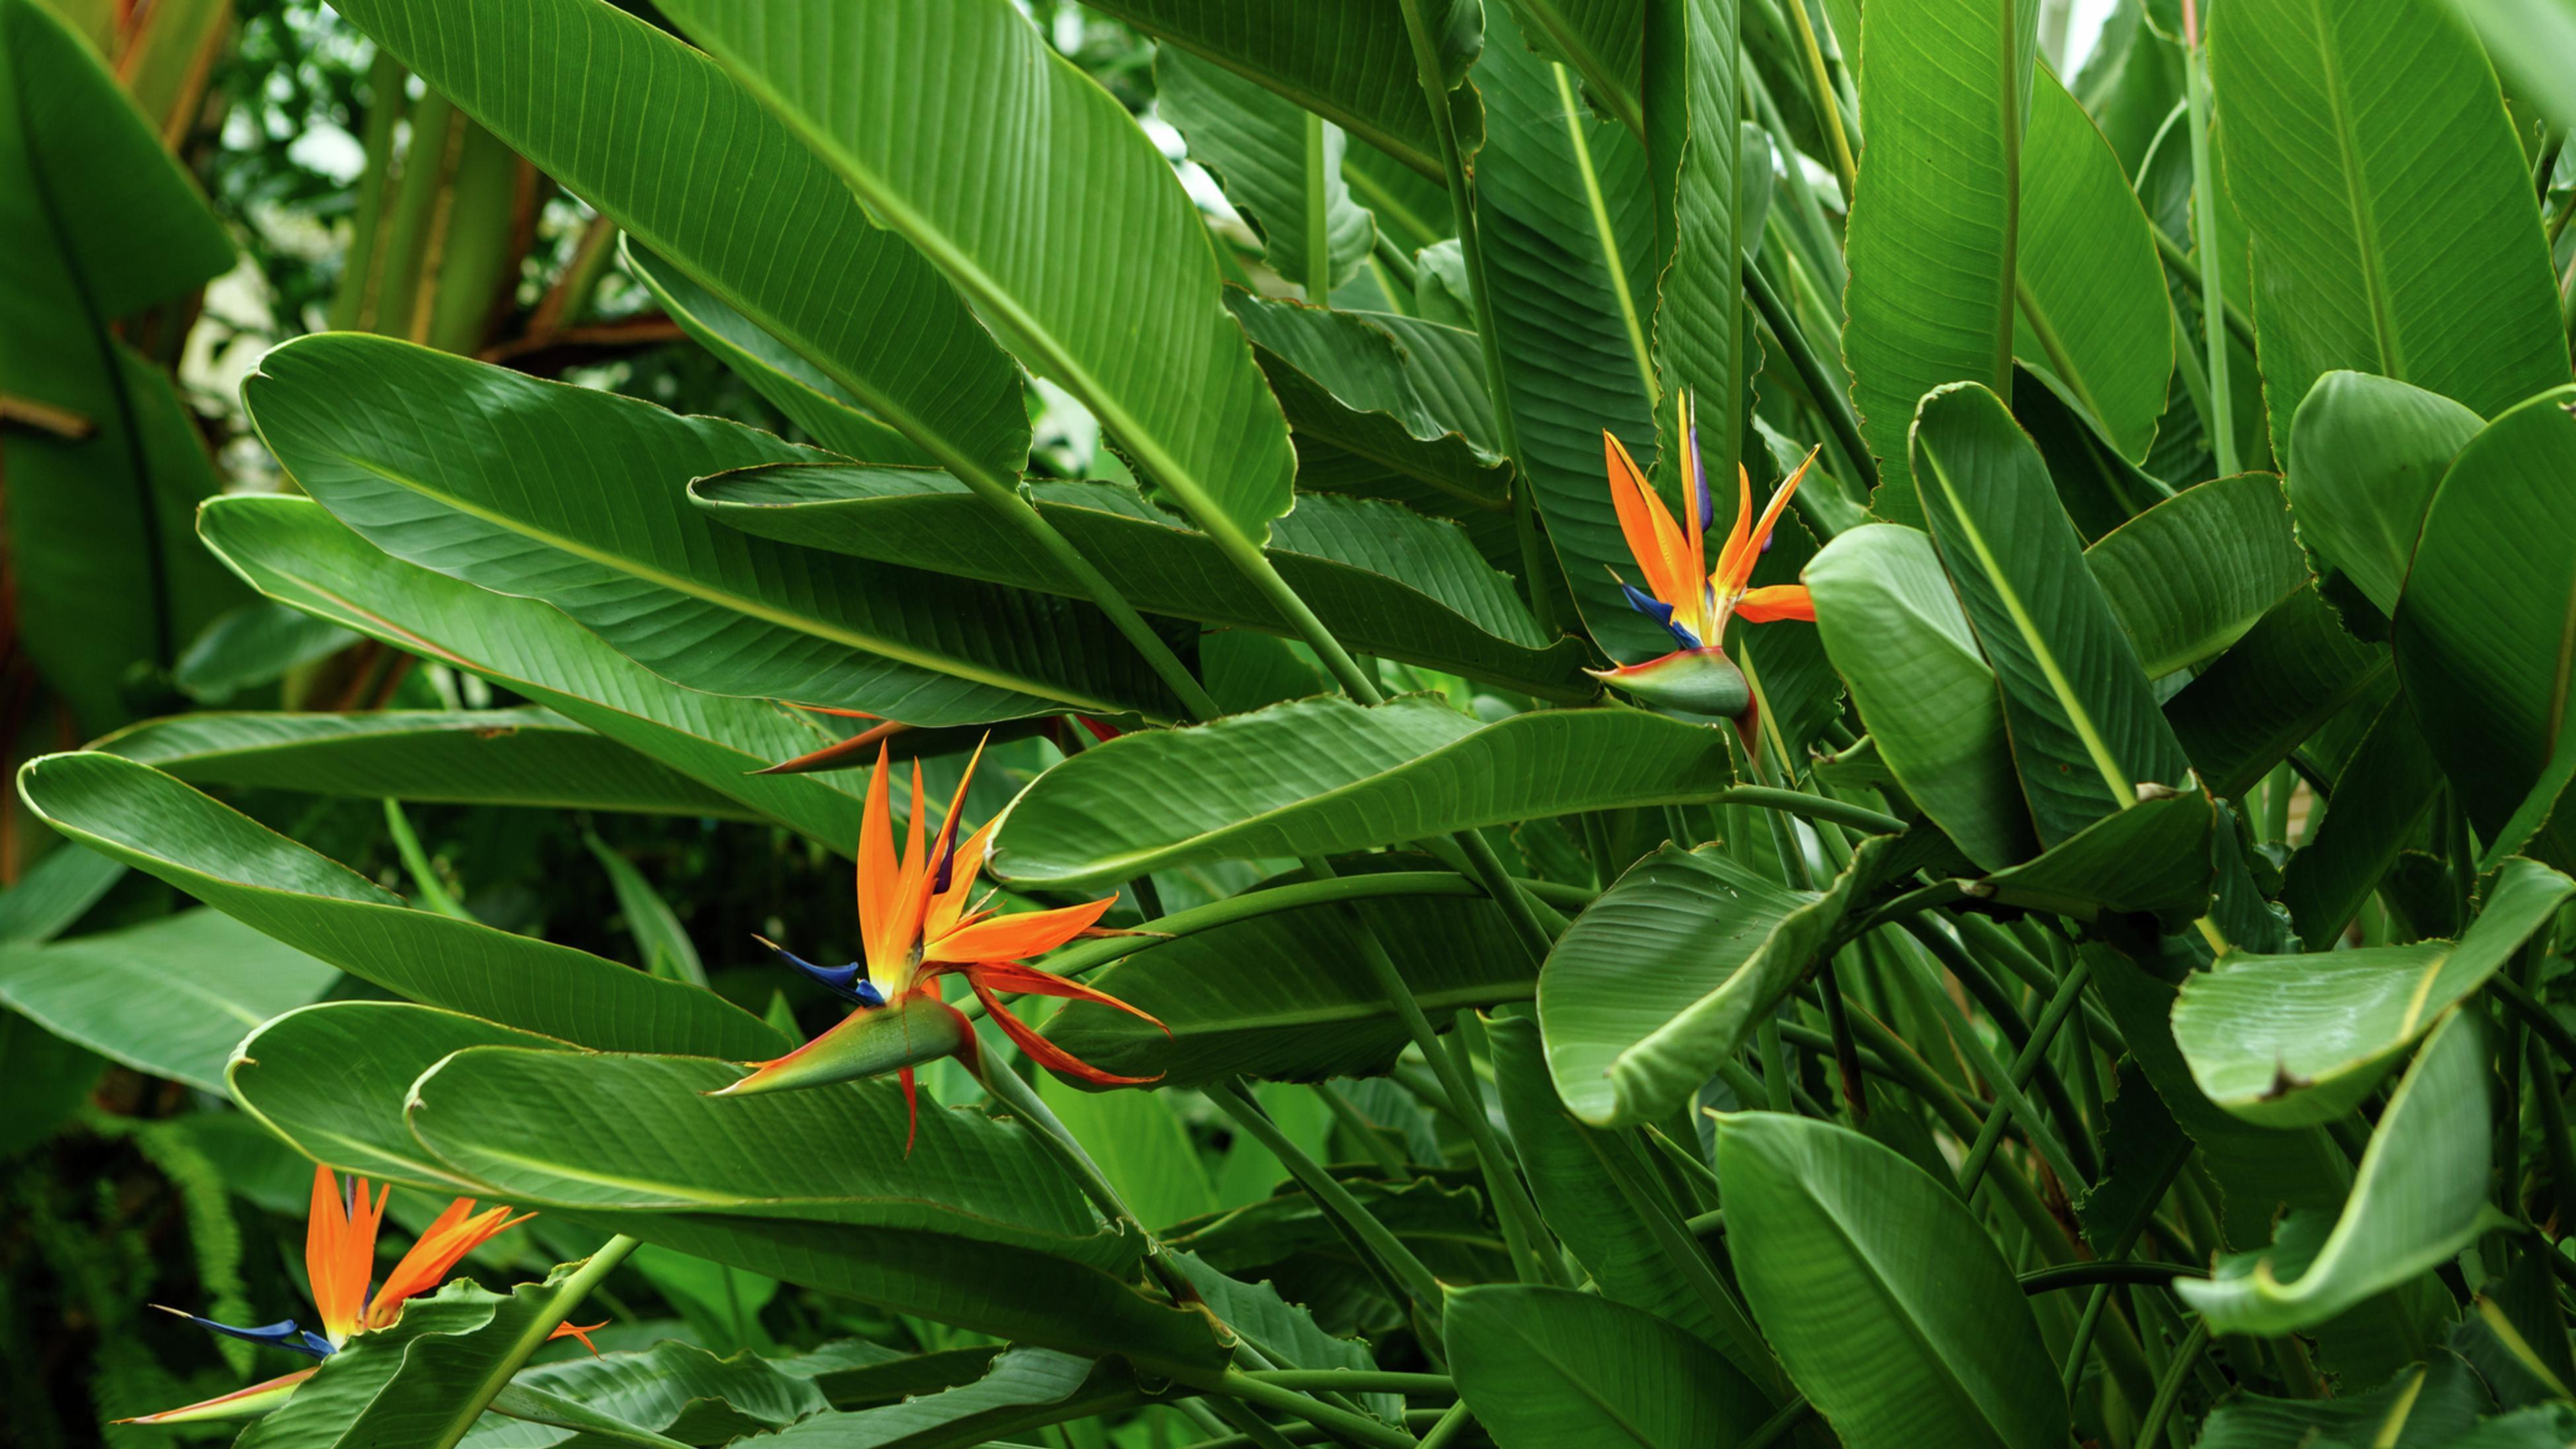 Bird of paradise (Strelitzia) plant with its distinctive orange and deep purple flower.